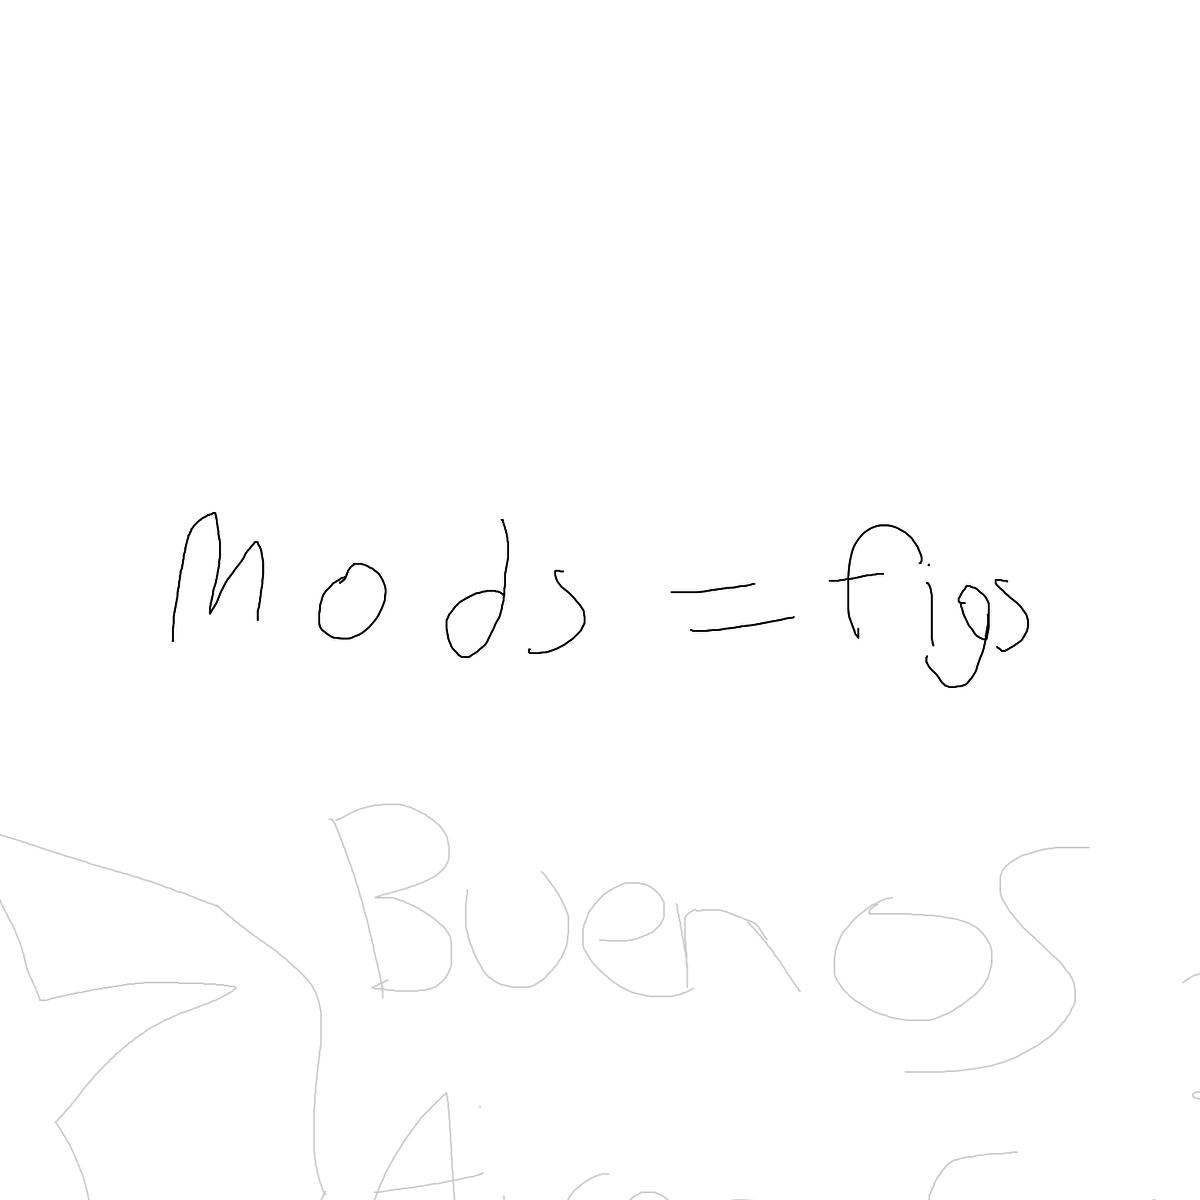 BAAAM drawing#6841 lat:-12.0500030517578120lng: -51.5038909912109400